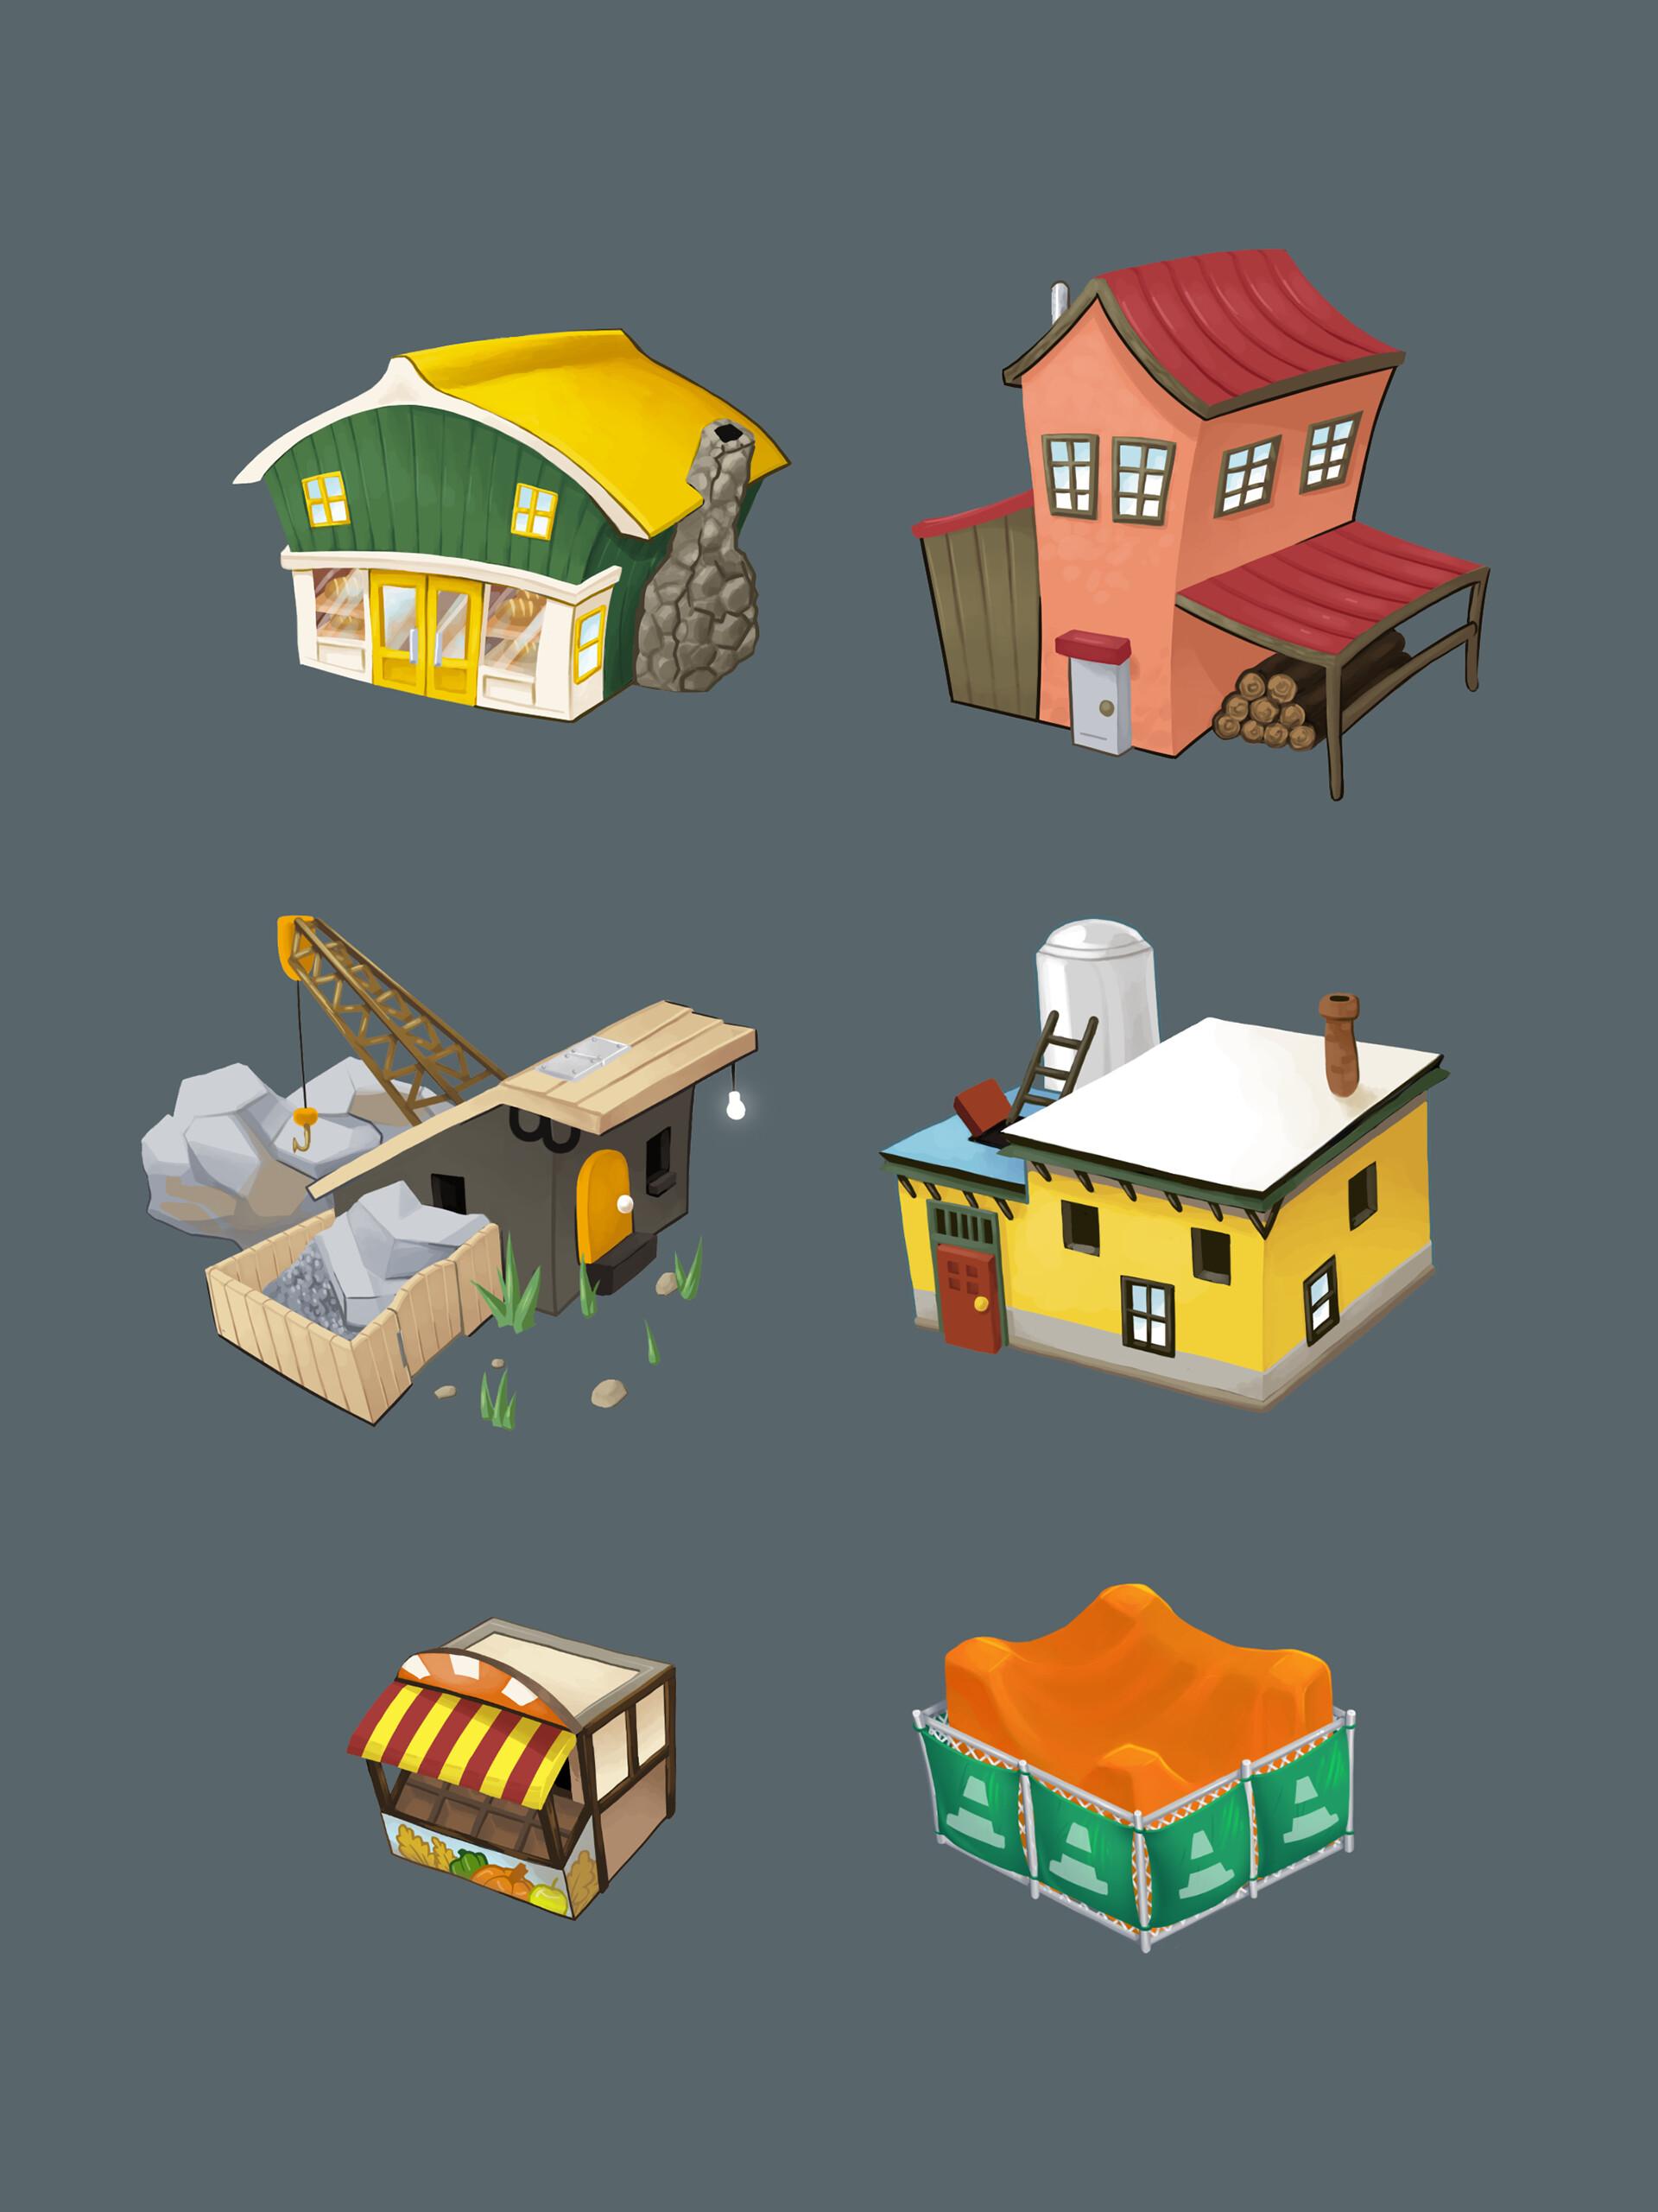 Painted building concepts